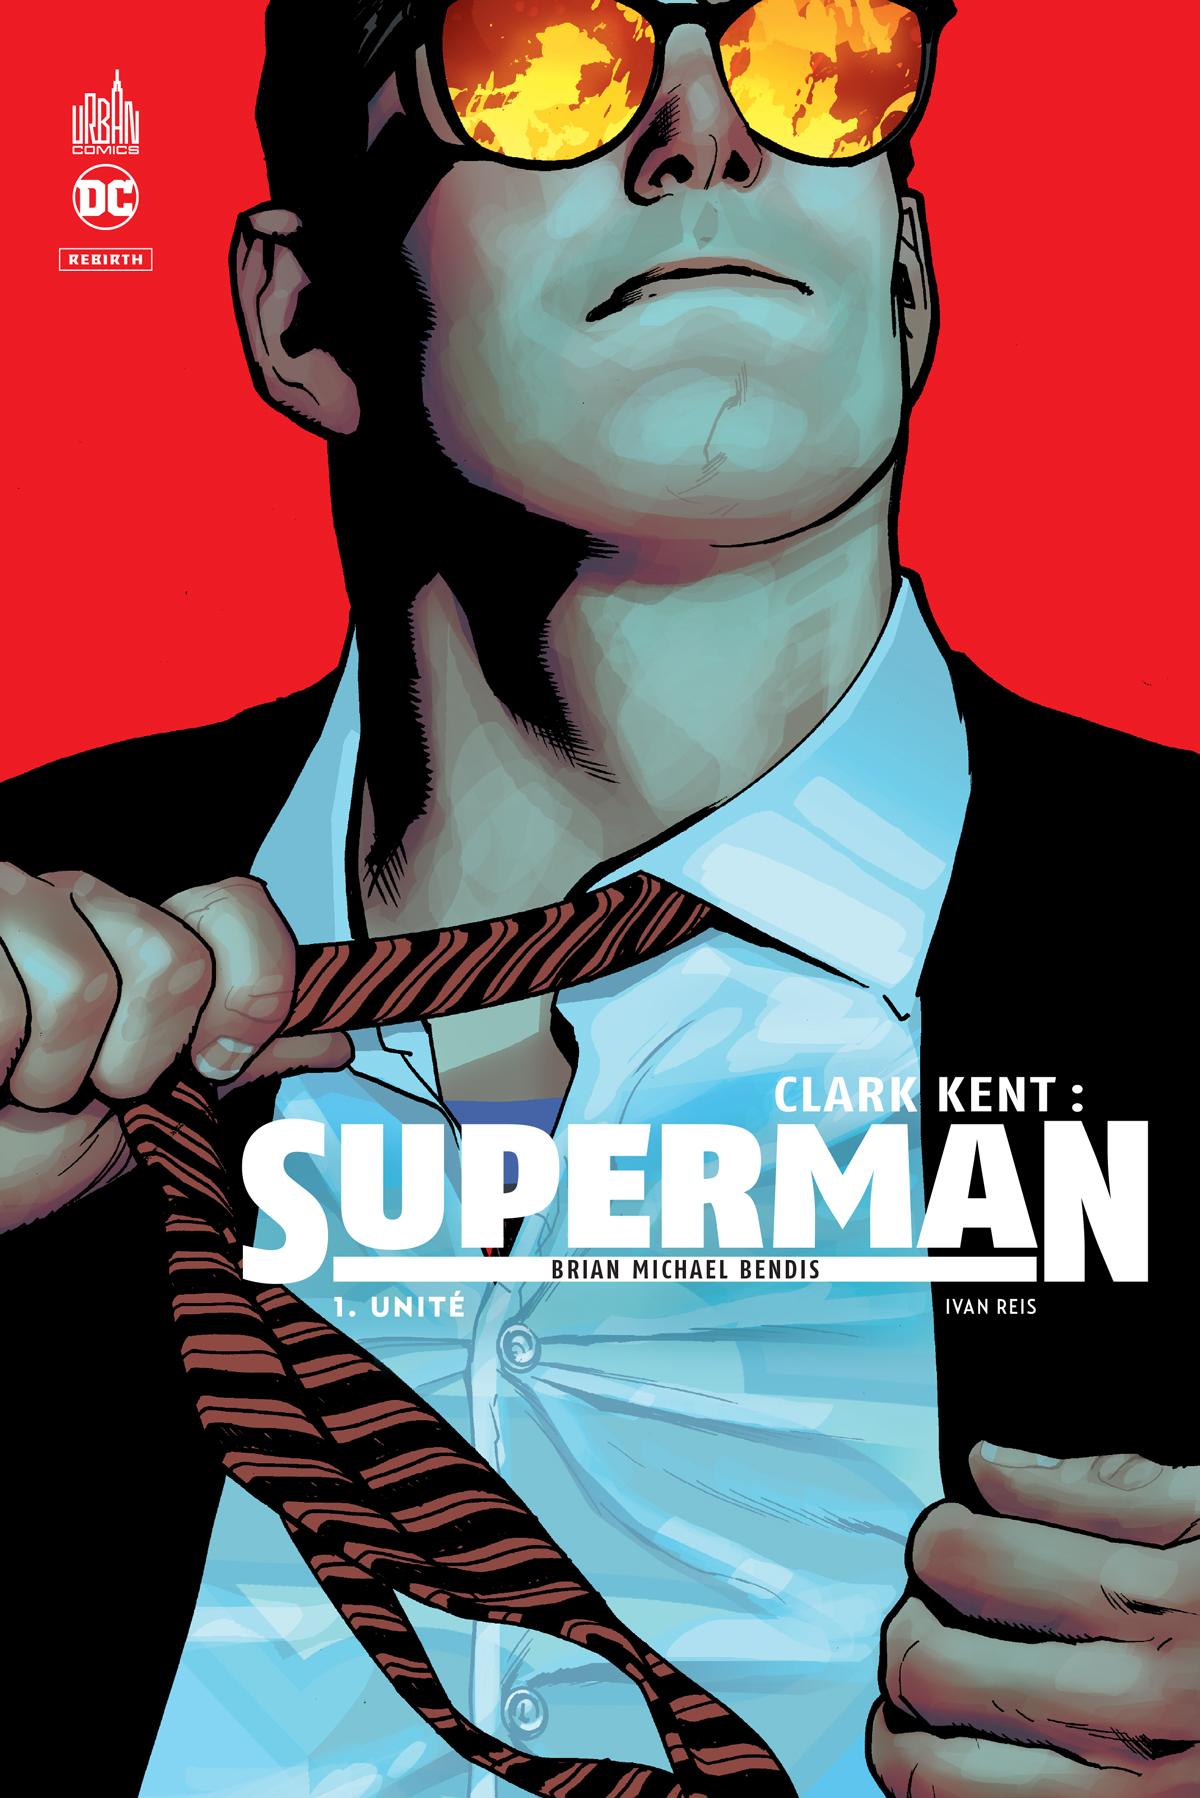 Clark Kent - Superman 1